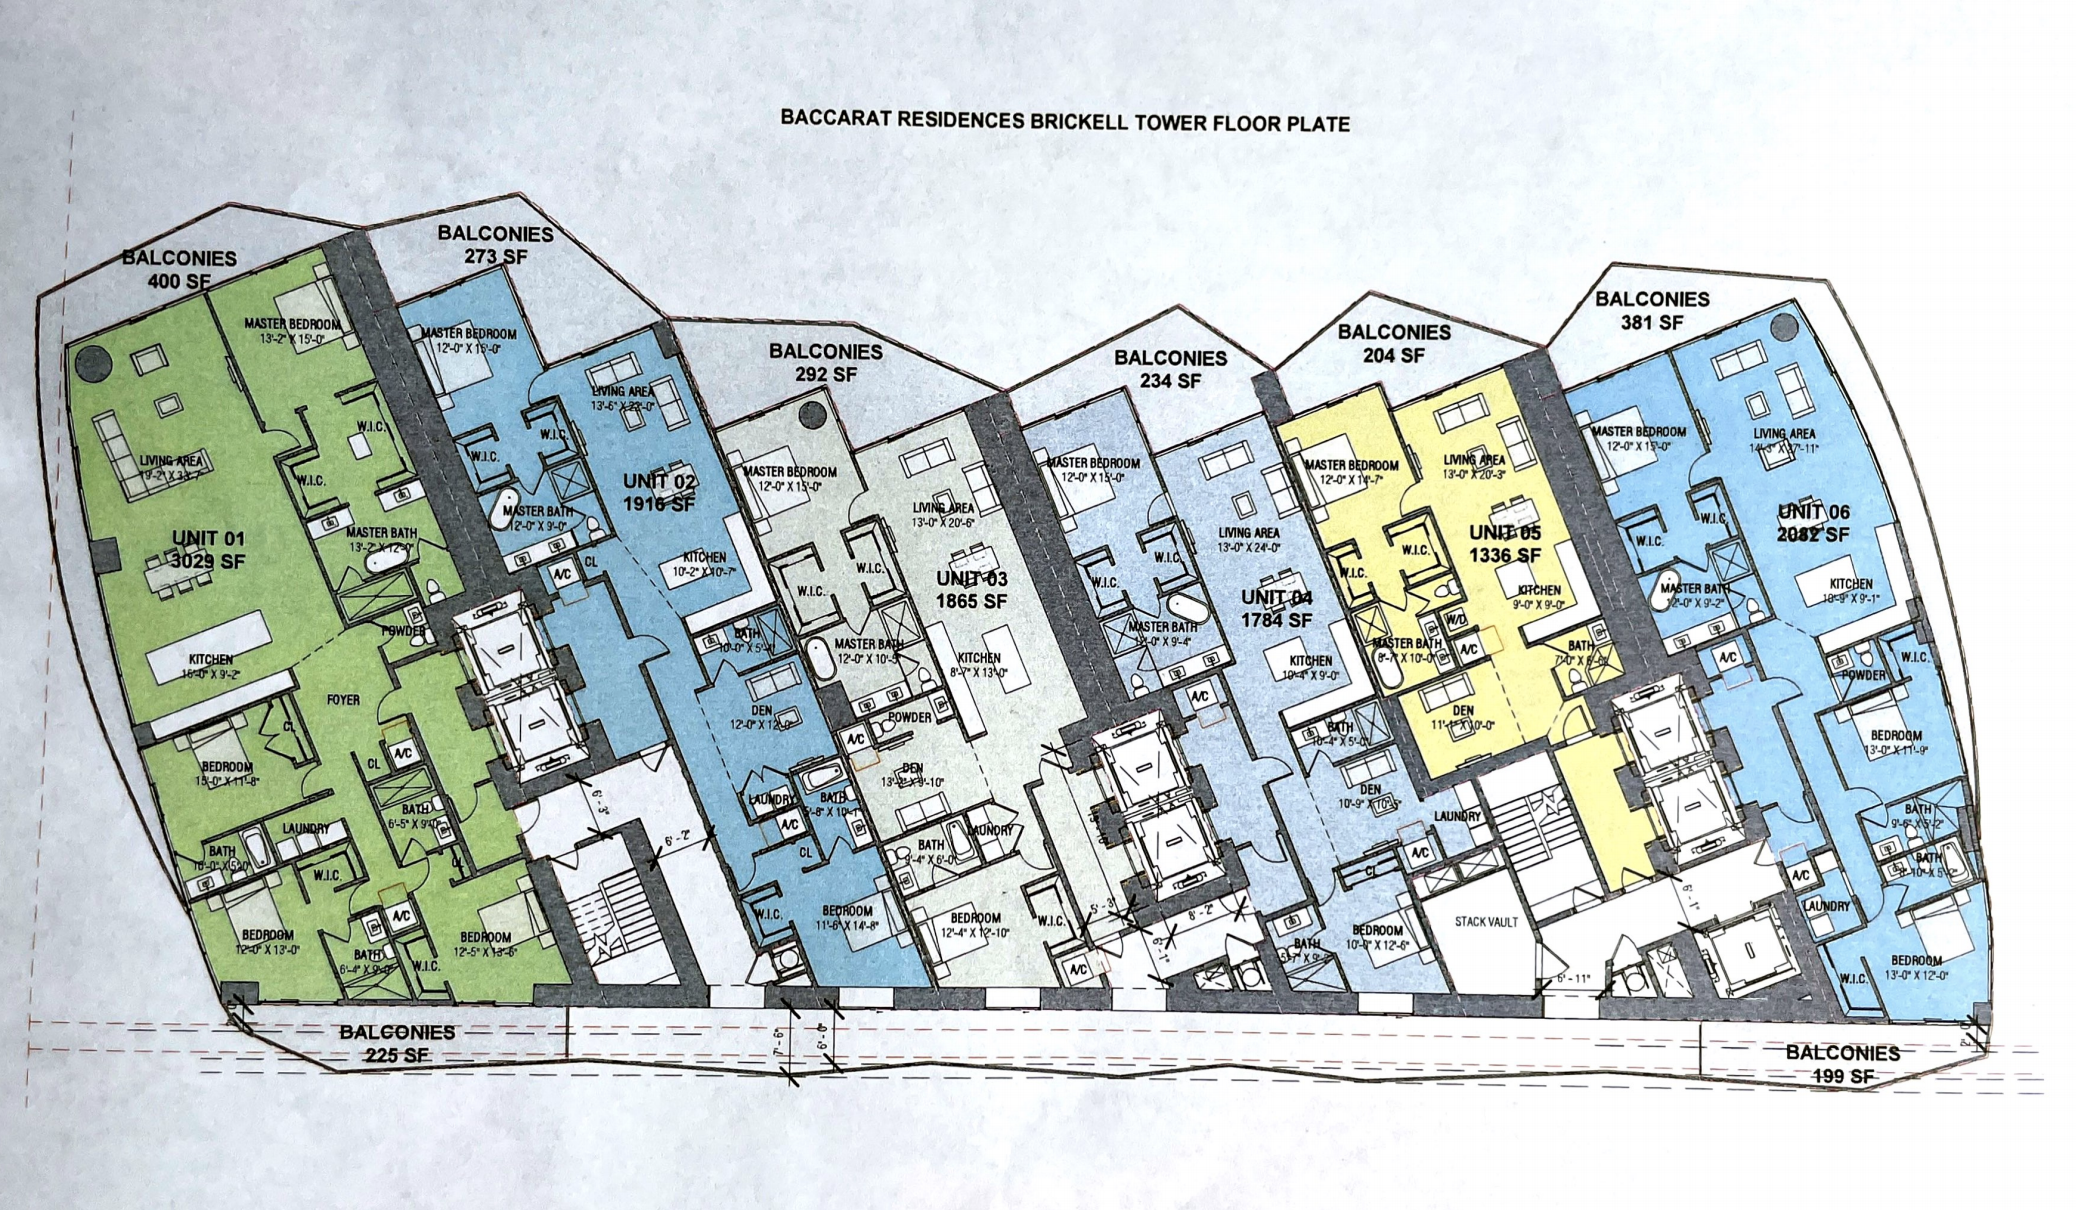 Key Floor Plan Baccarat Residences Miami